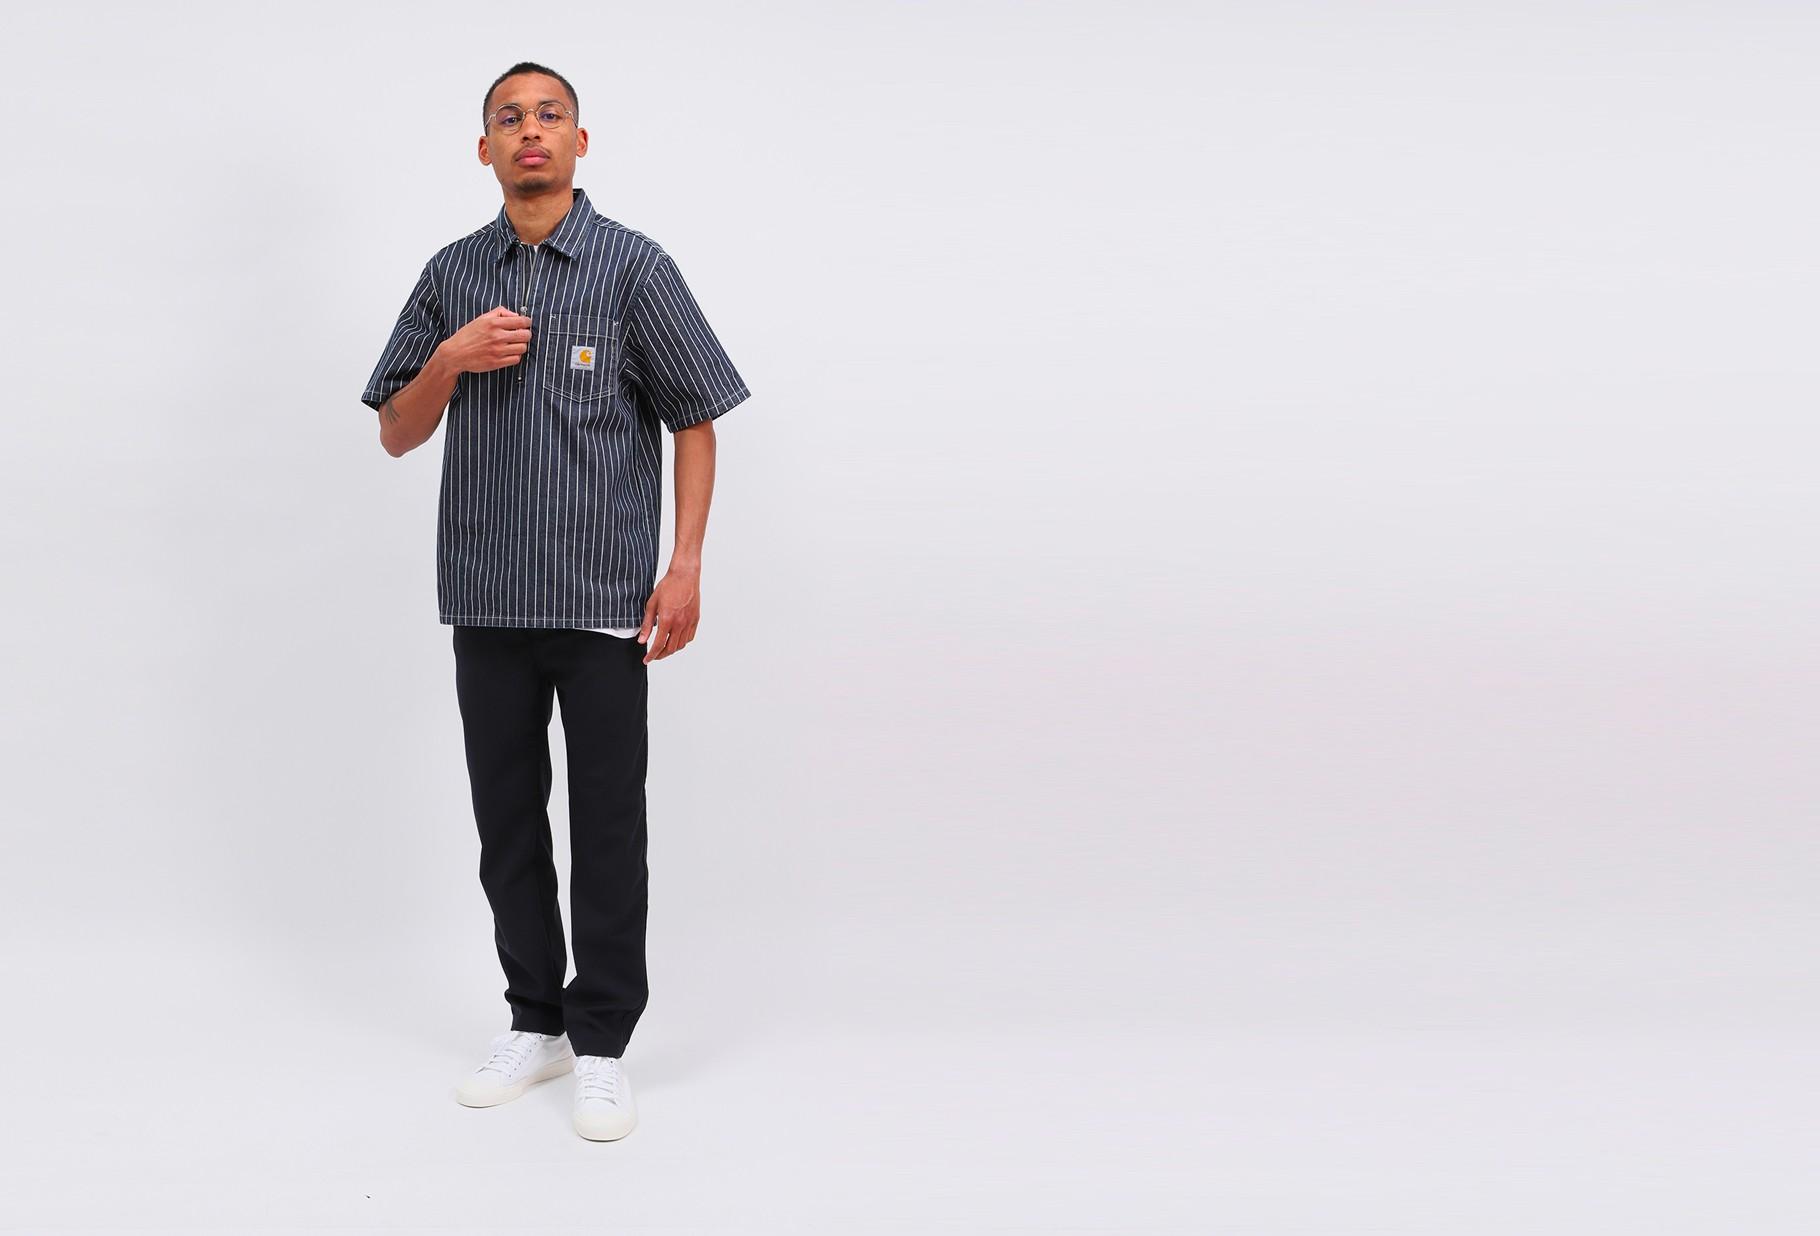 CARHARTT WIP / S/s trade shirt cotton stripe Dark navy/wax rinsed